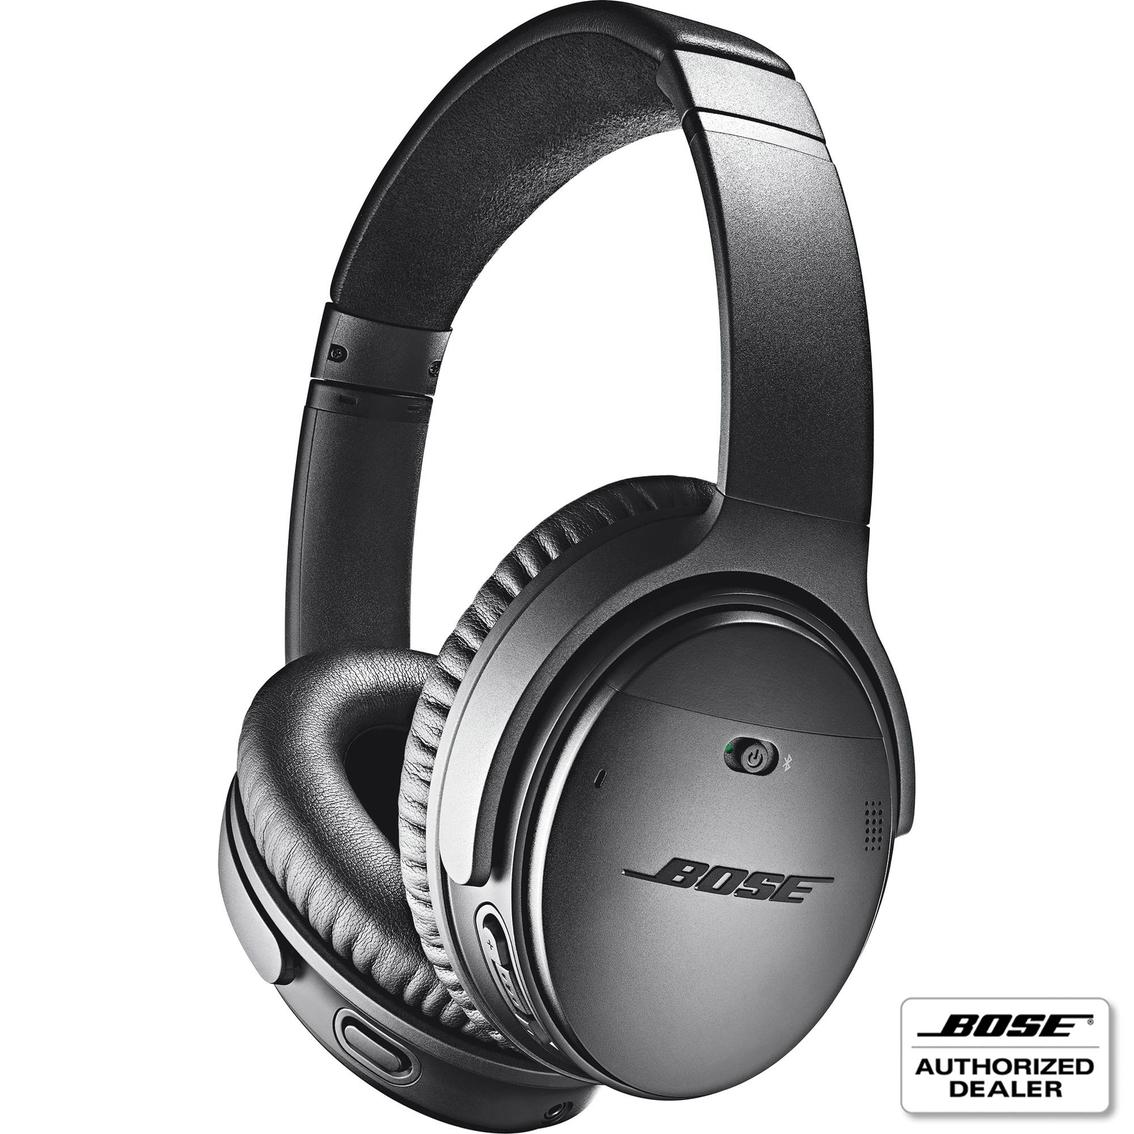 0465626efc9 Bose Qc35 Ii Wireless Headphones | Bose Headphones & Headsets ...